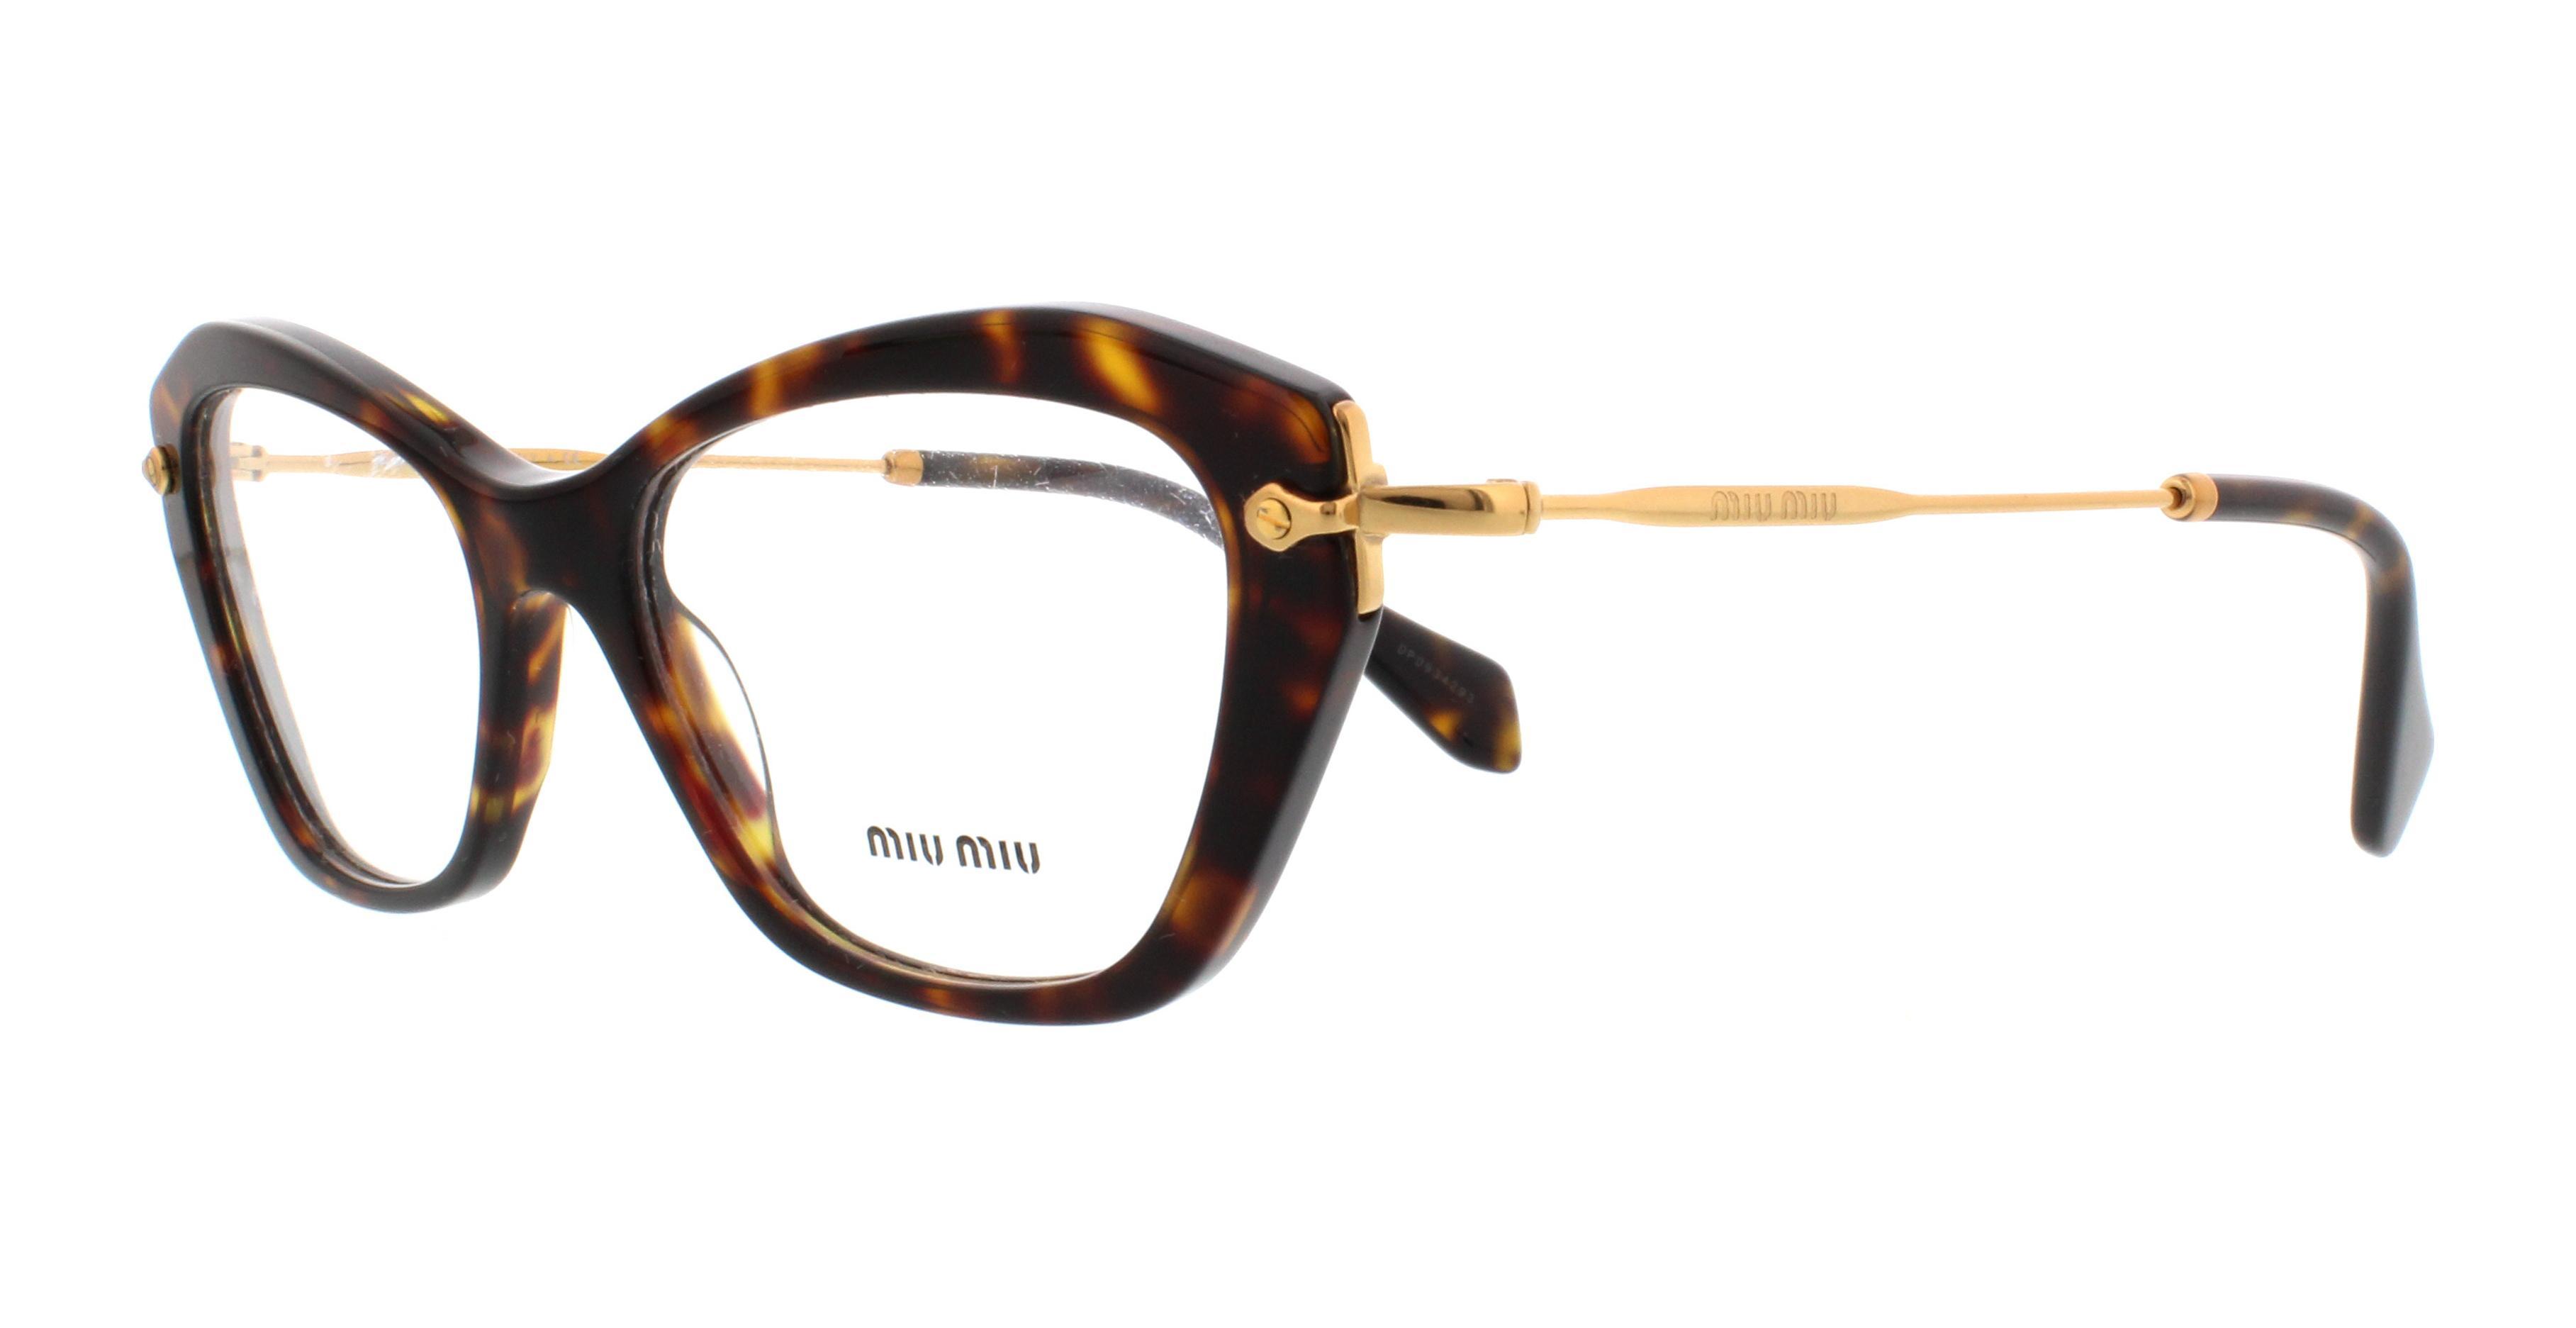 edc5cf6511543 Designer frames outlet miu jpg 3634x1873 Miu havana glasses